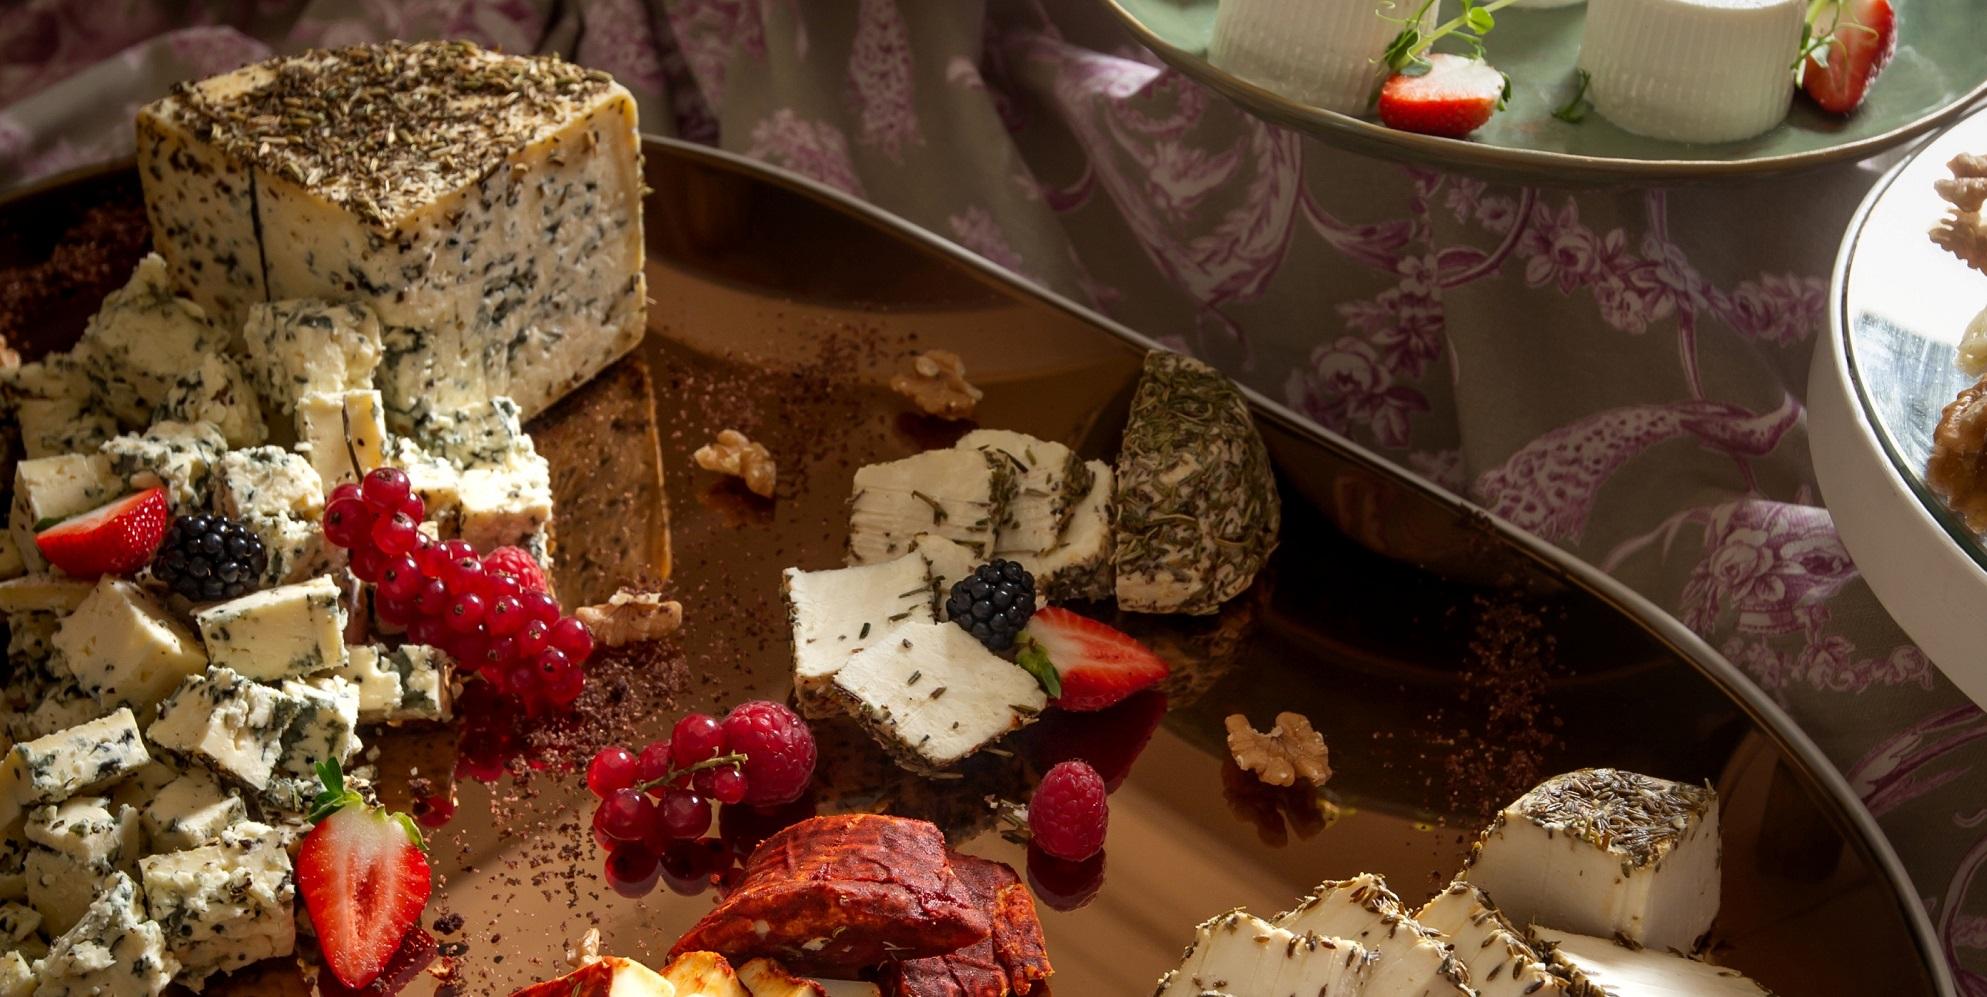 Brunch Hotel Château Monfort (20129 Milano)